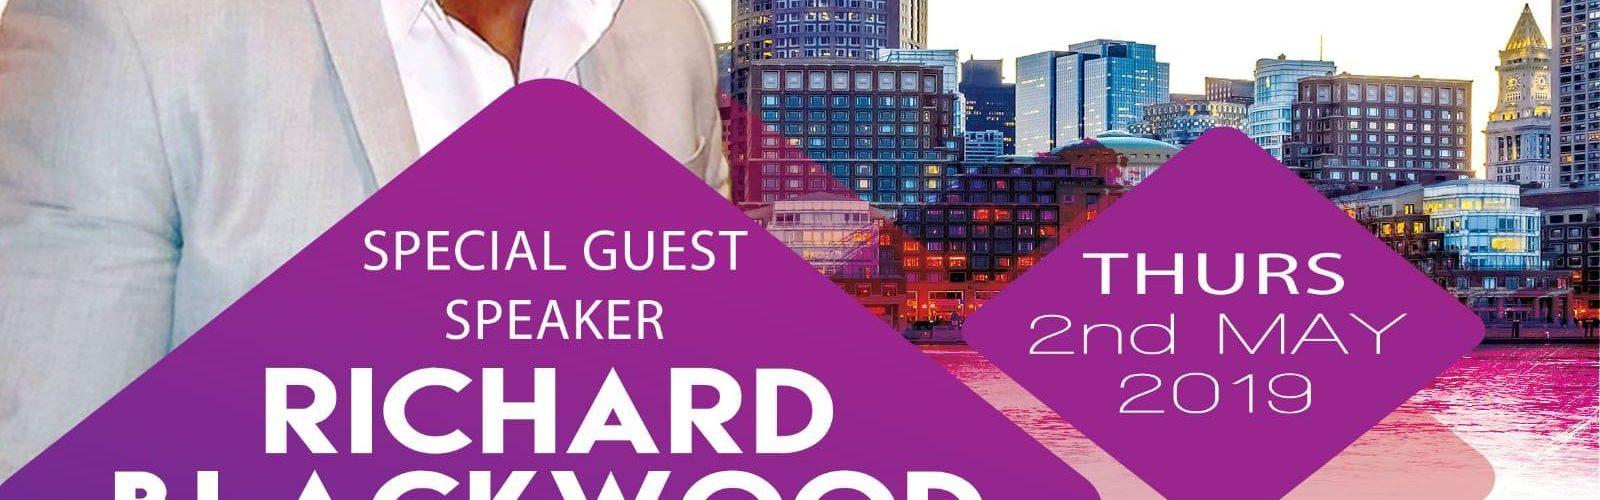 Networth & Vibe: 2nd May 2019 featuring Richard Blackwood